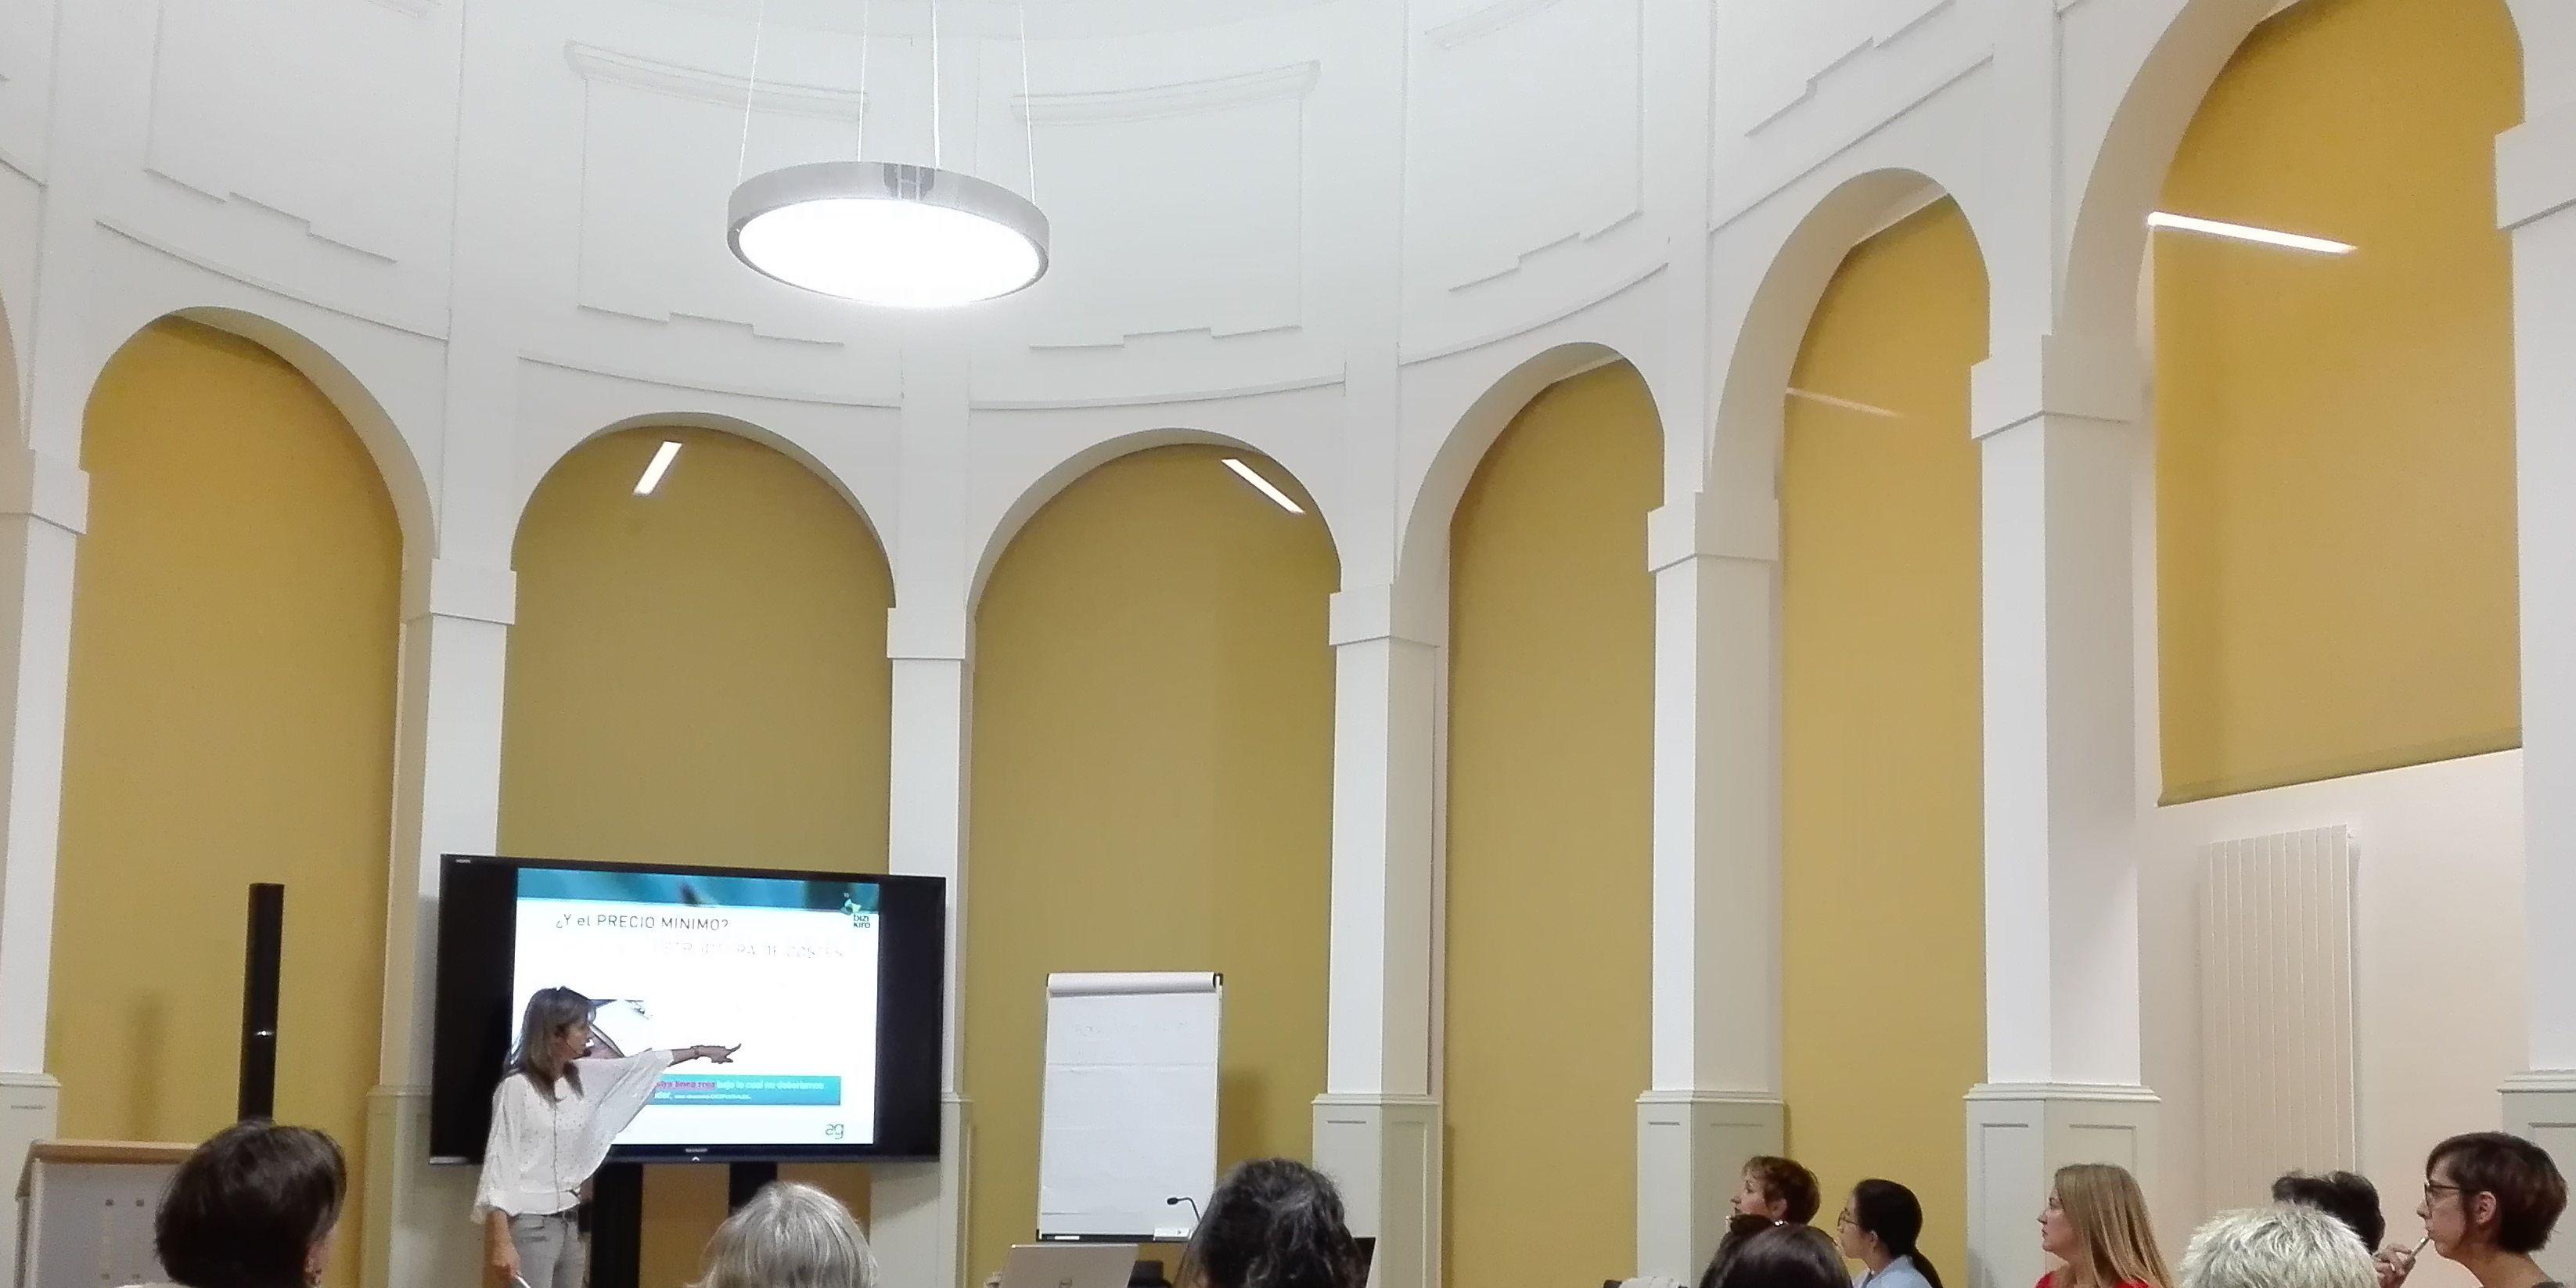 Miércoles de Networking. Vitoria-Gasteiz